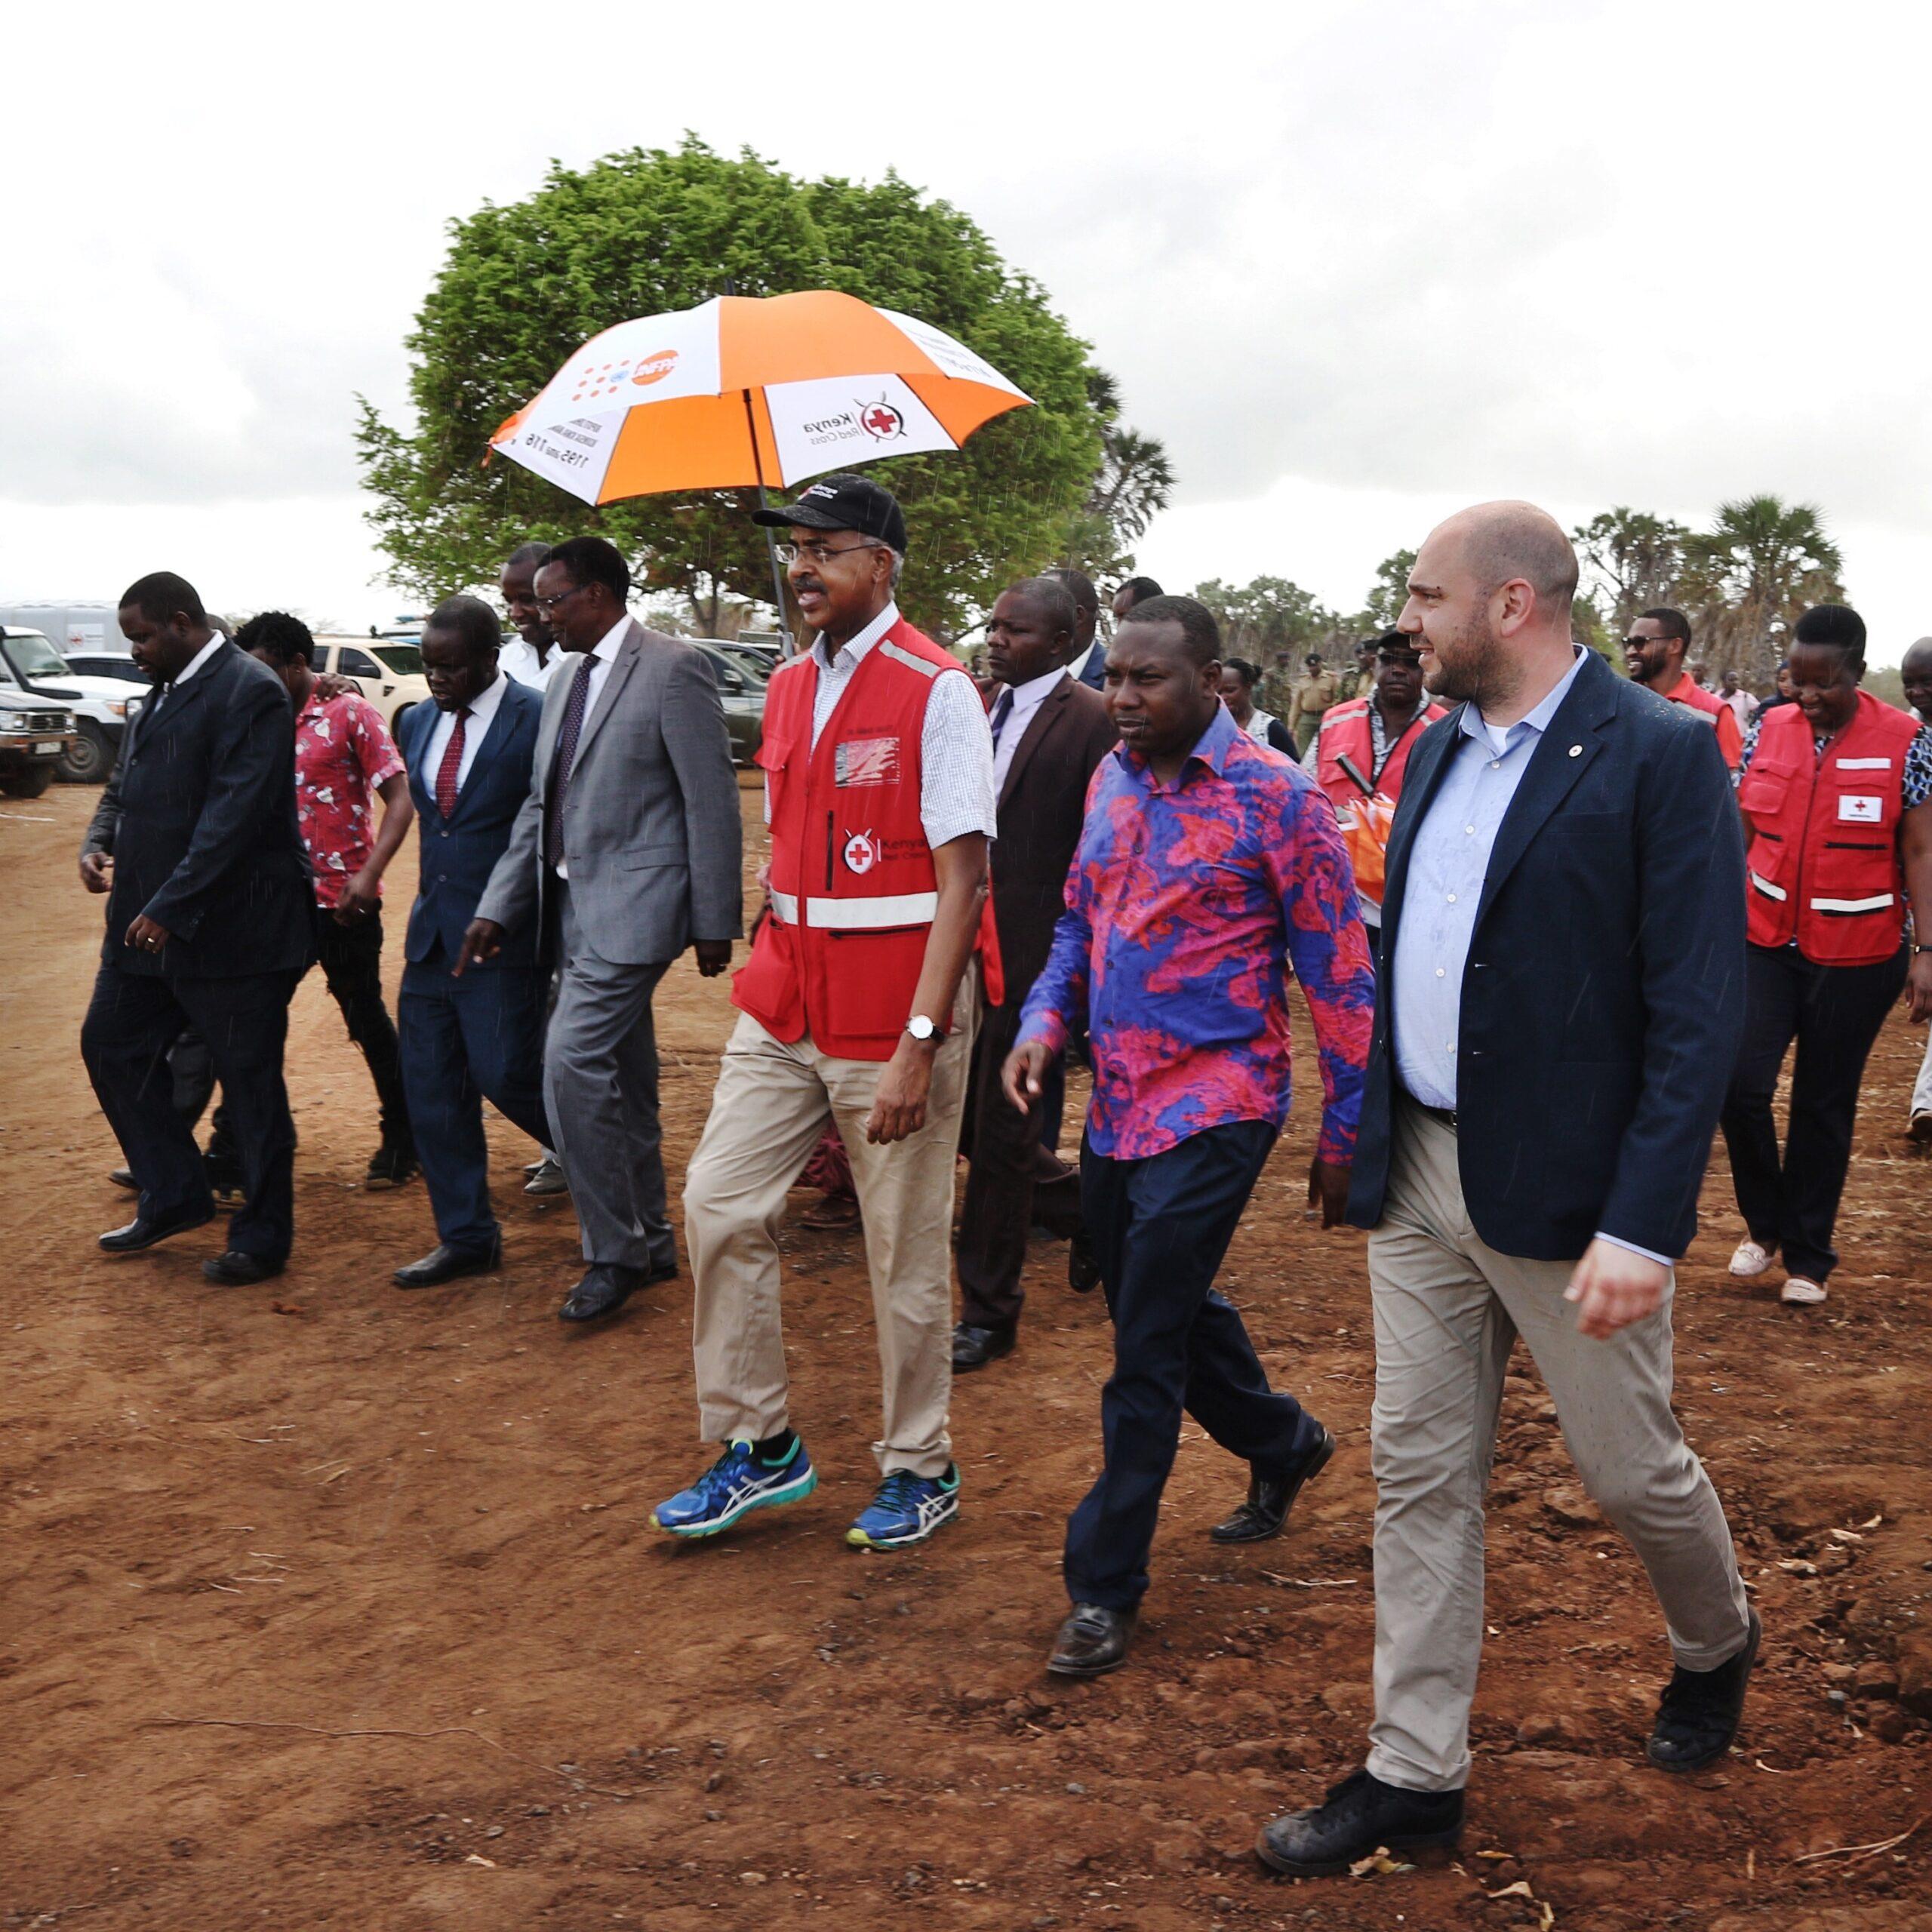 Kenya_Lamu_Inaugurazione 1